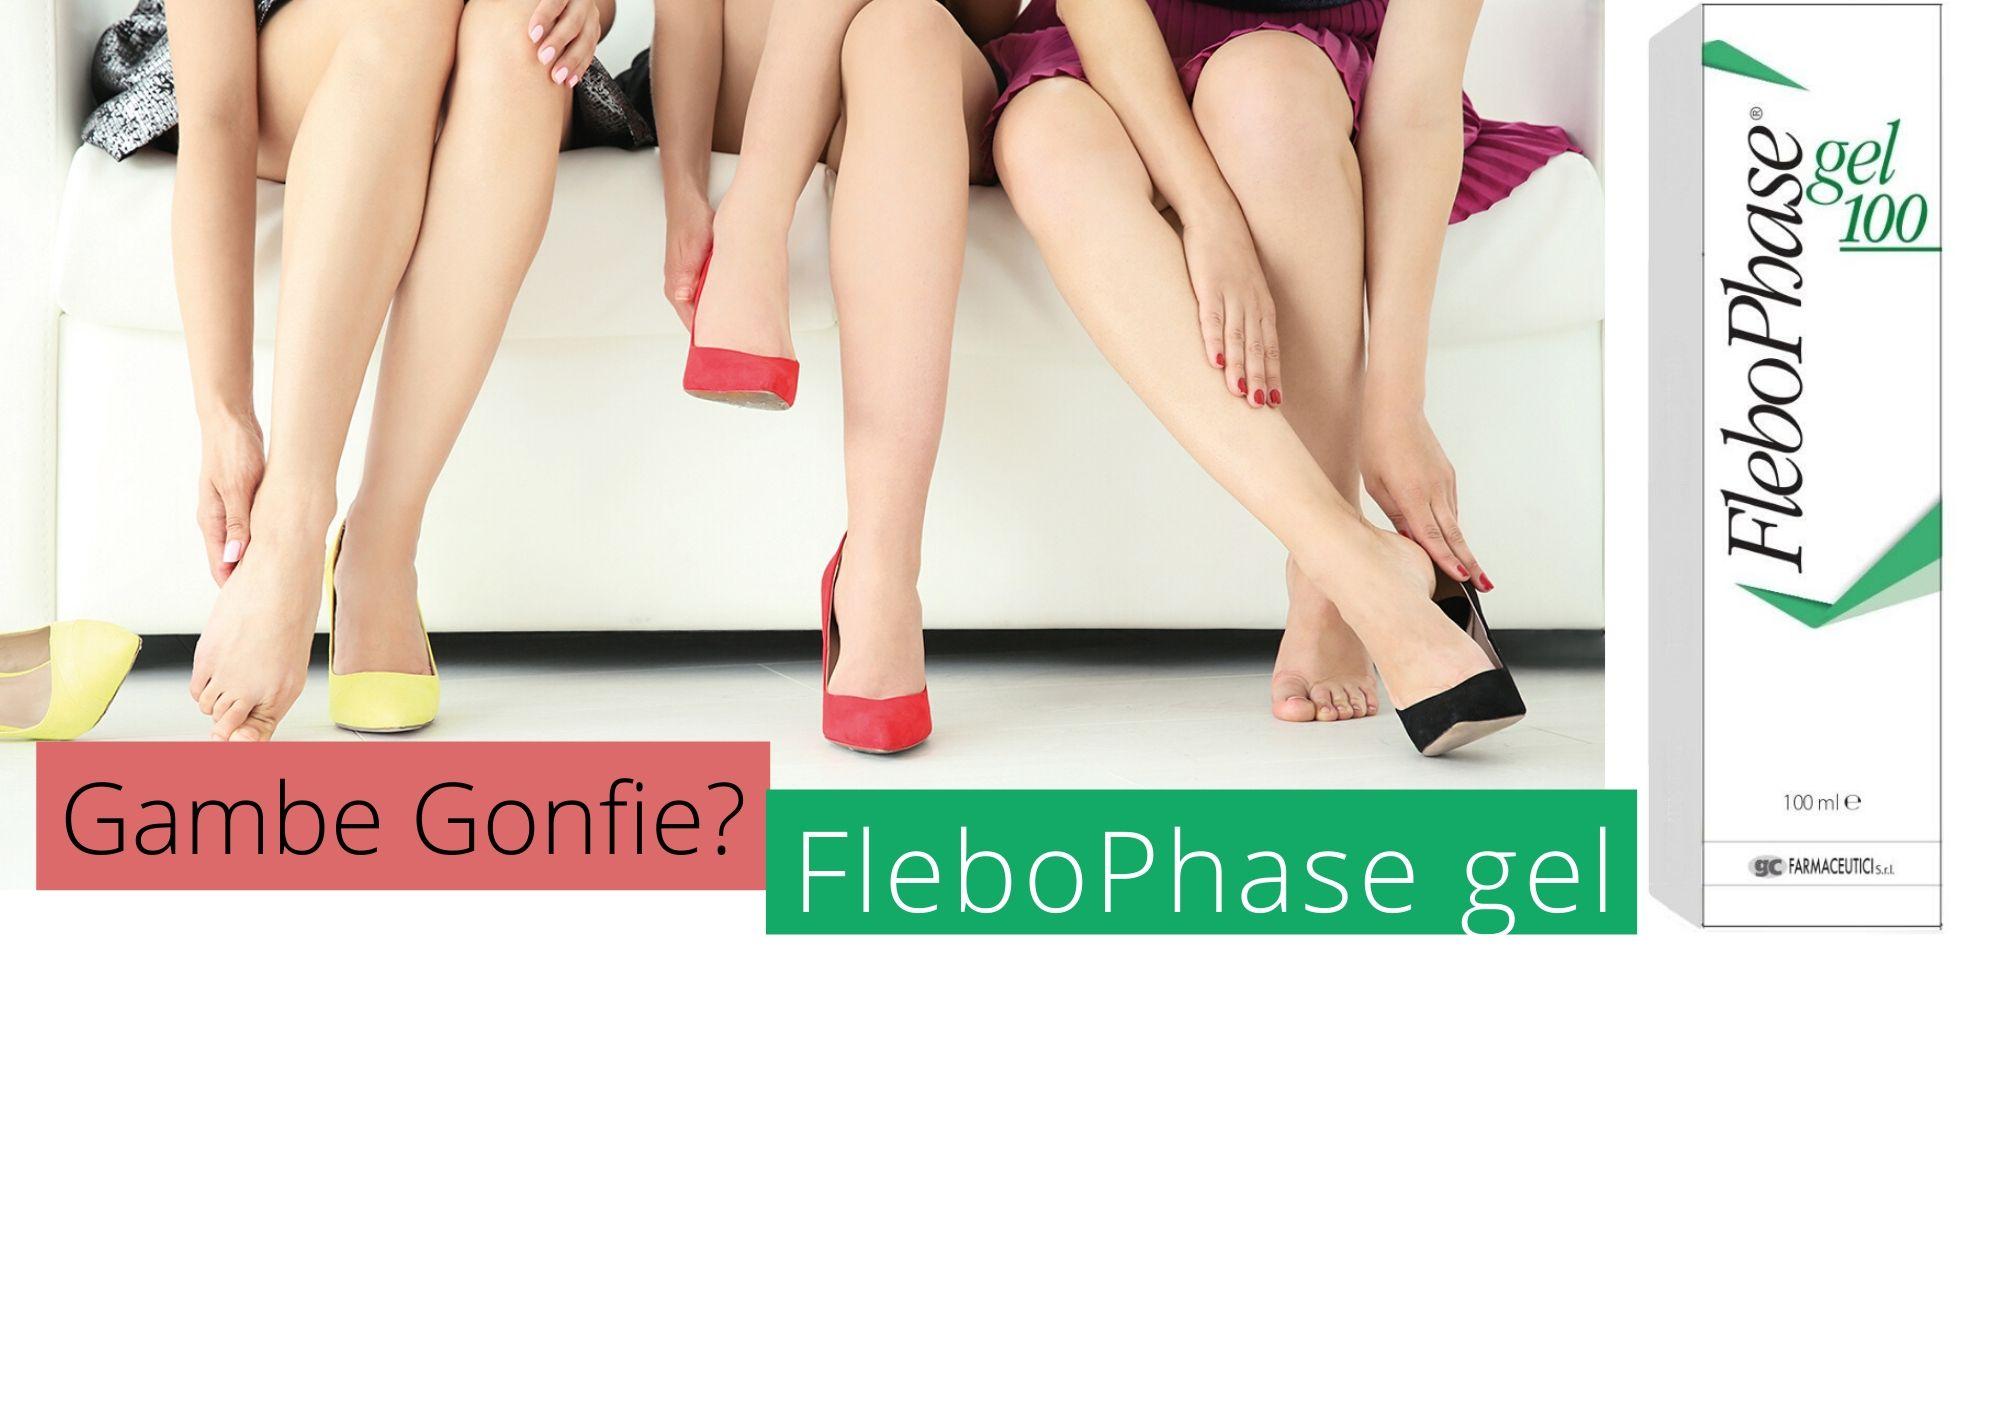 flebophase_gel_SITO_GC_1